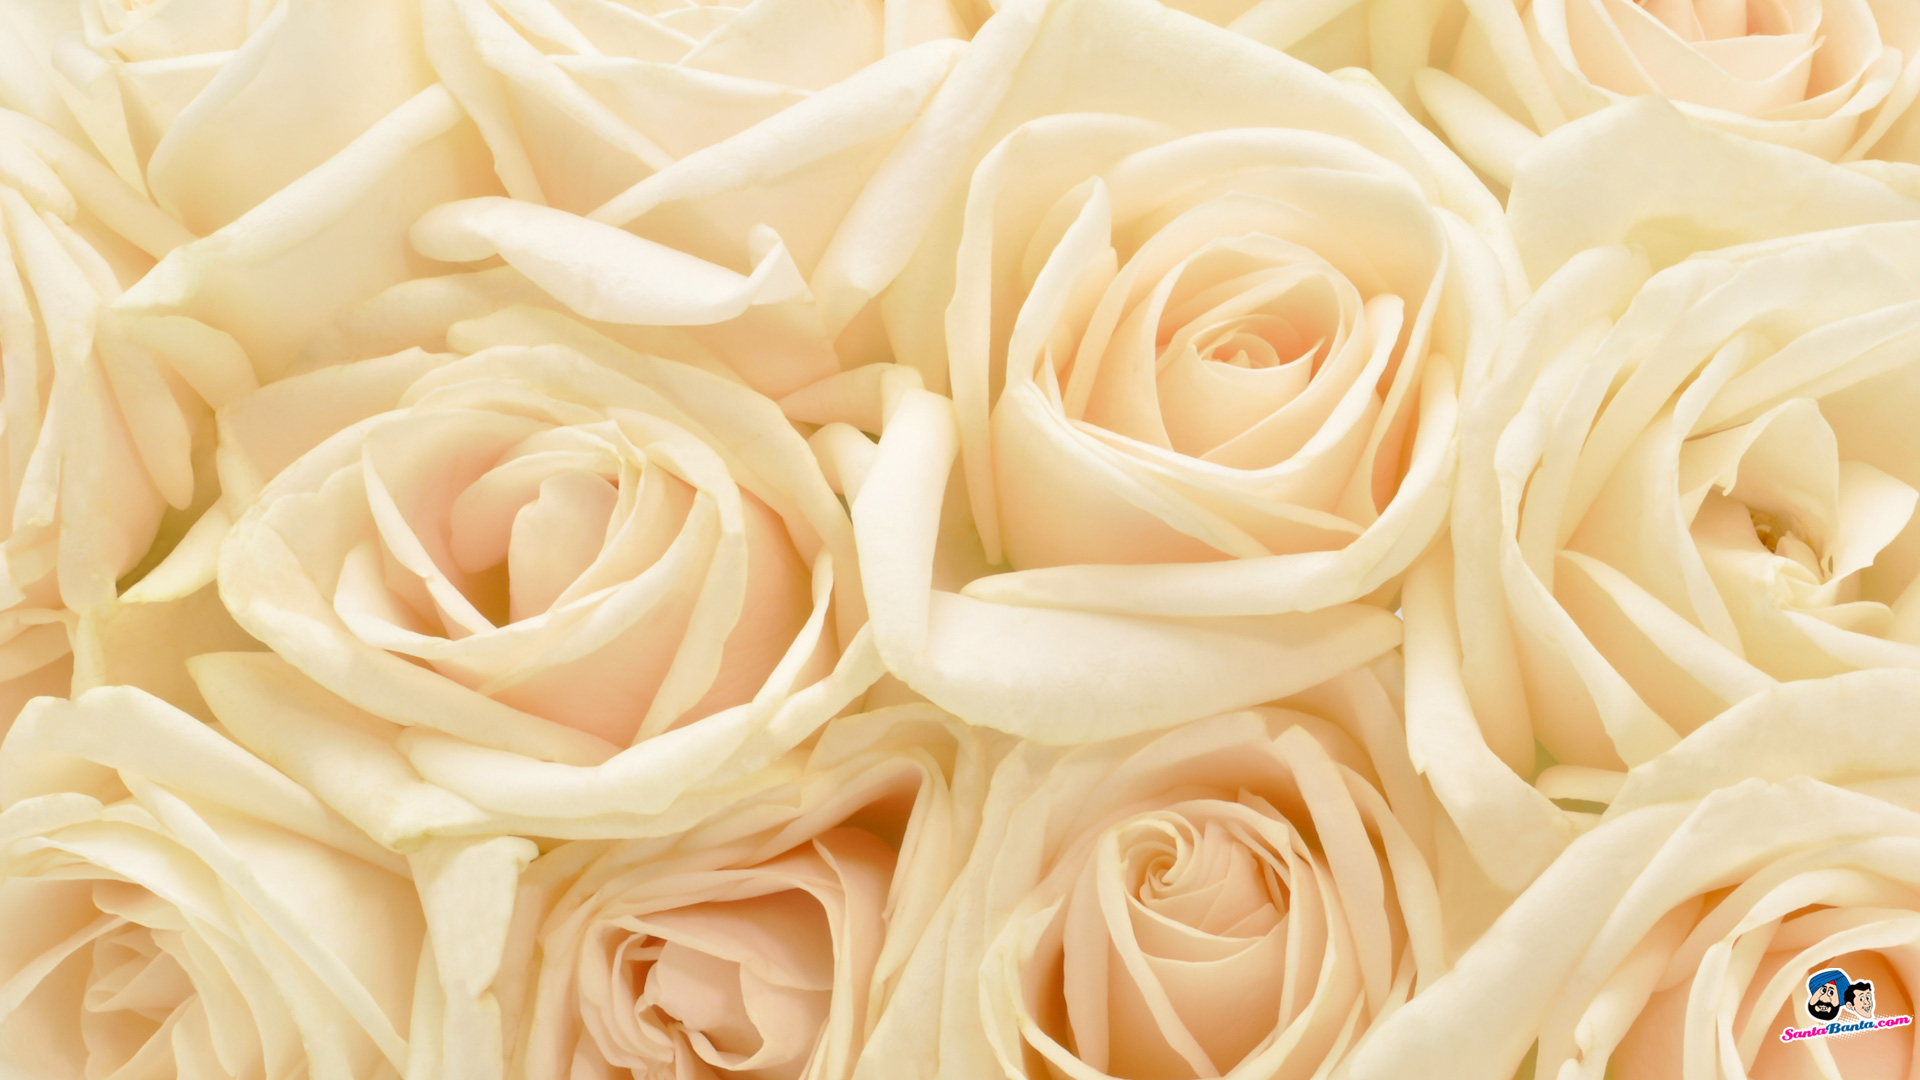 Knumathise Red And White Roses Tumblr Images